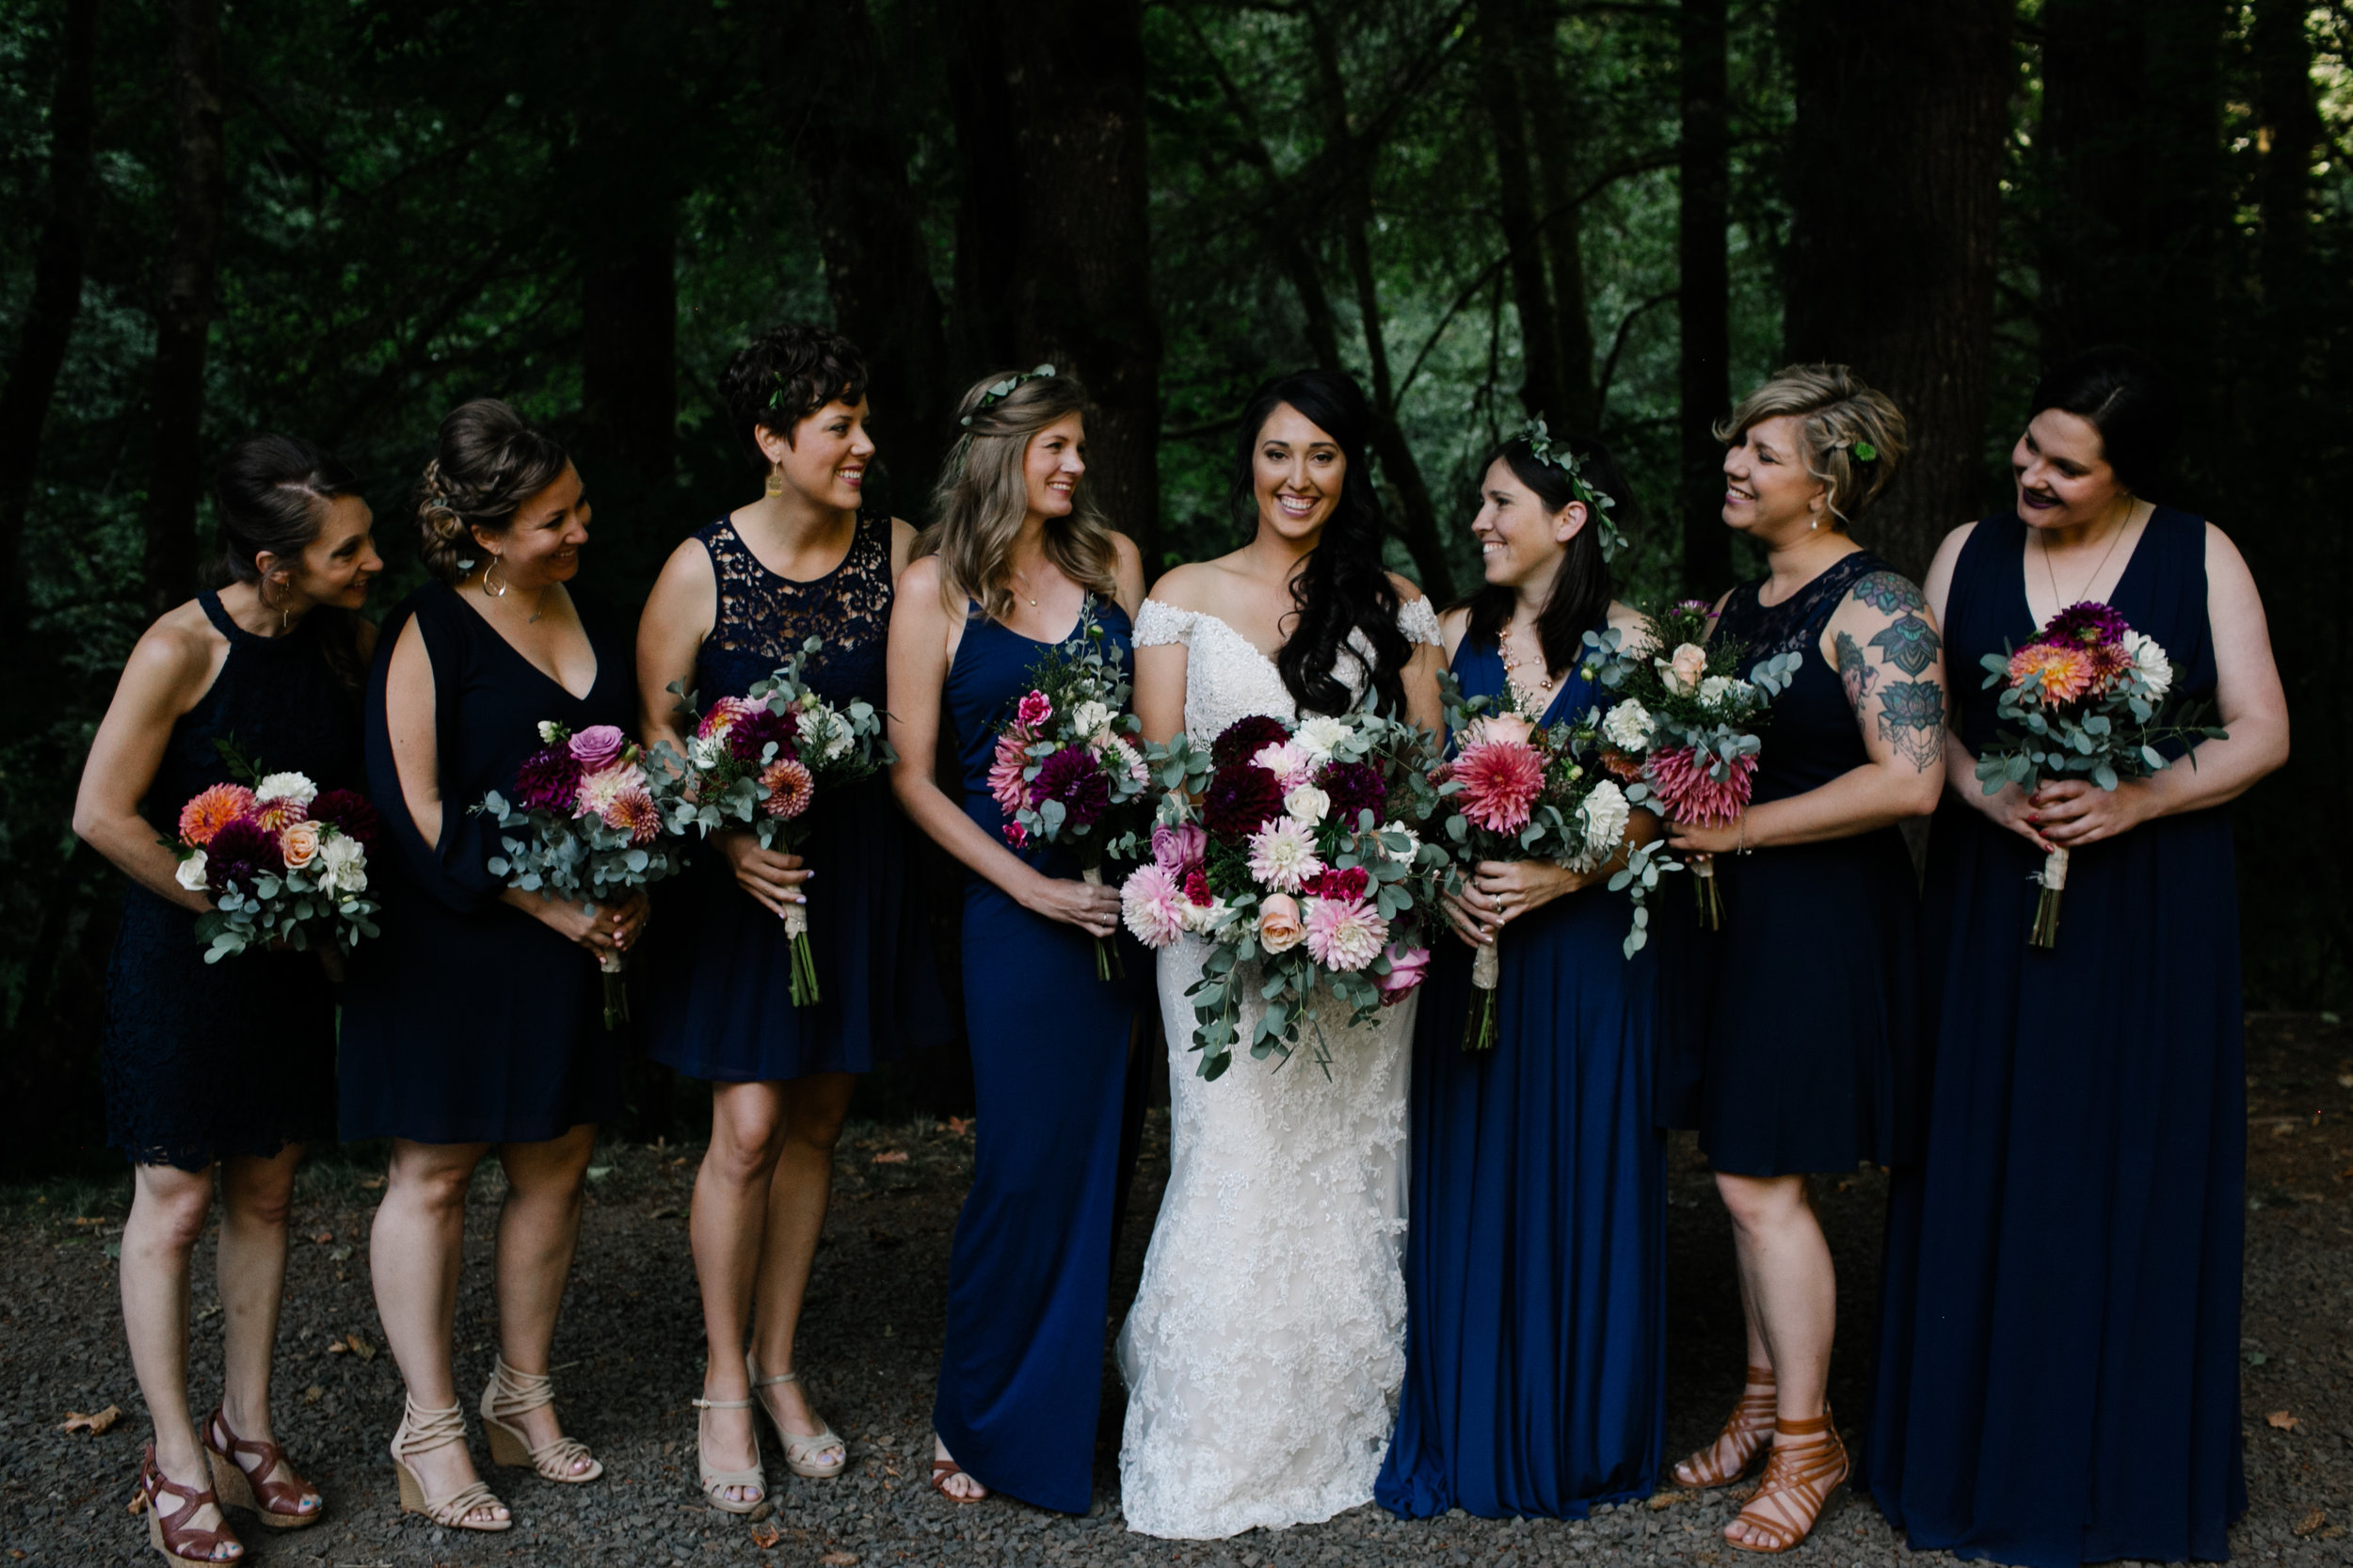 Sevlynn-Photography-Teresa-Chandler-Wedding-30.jpg